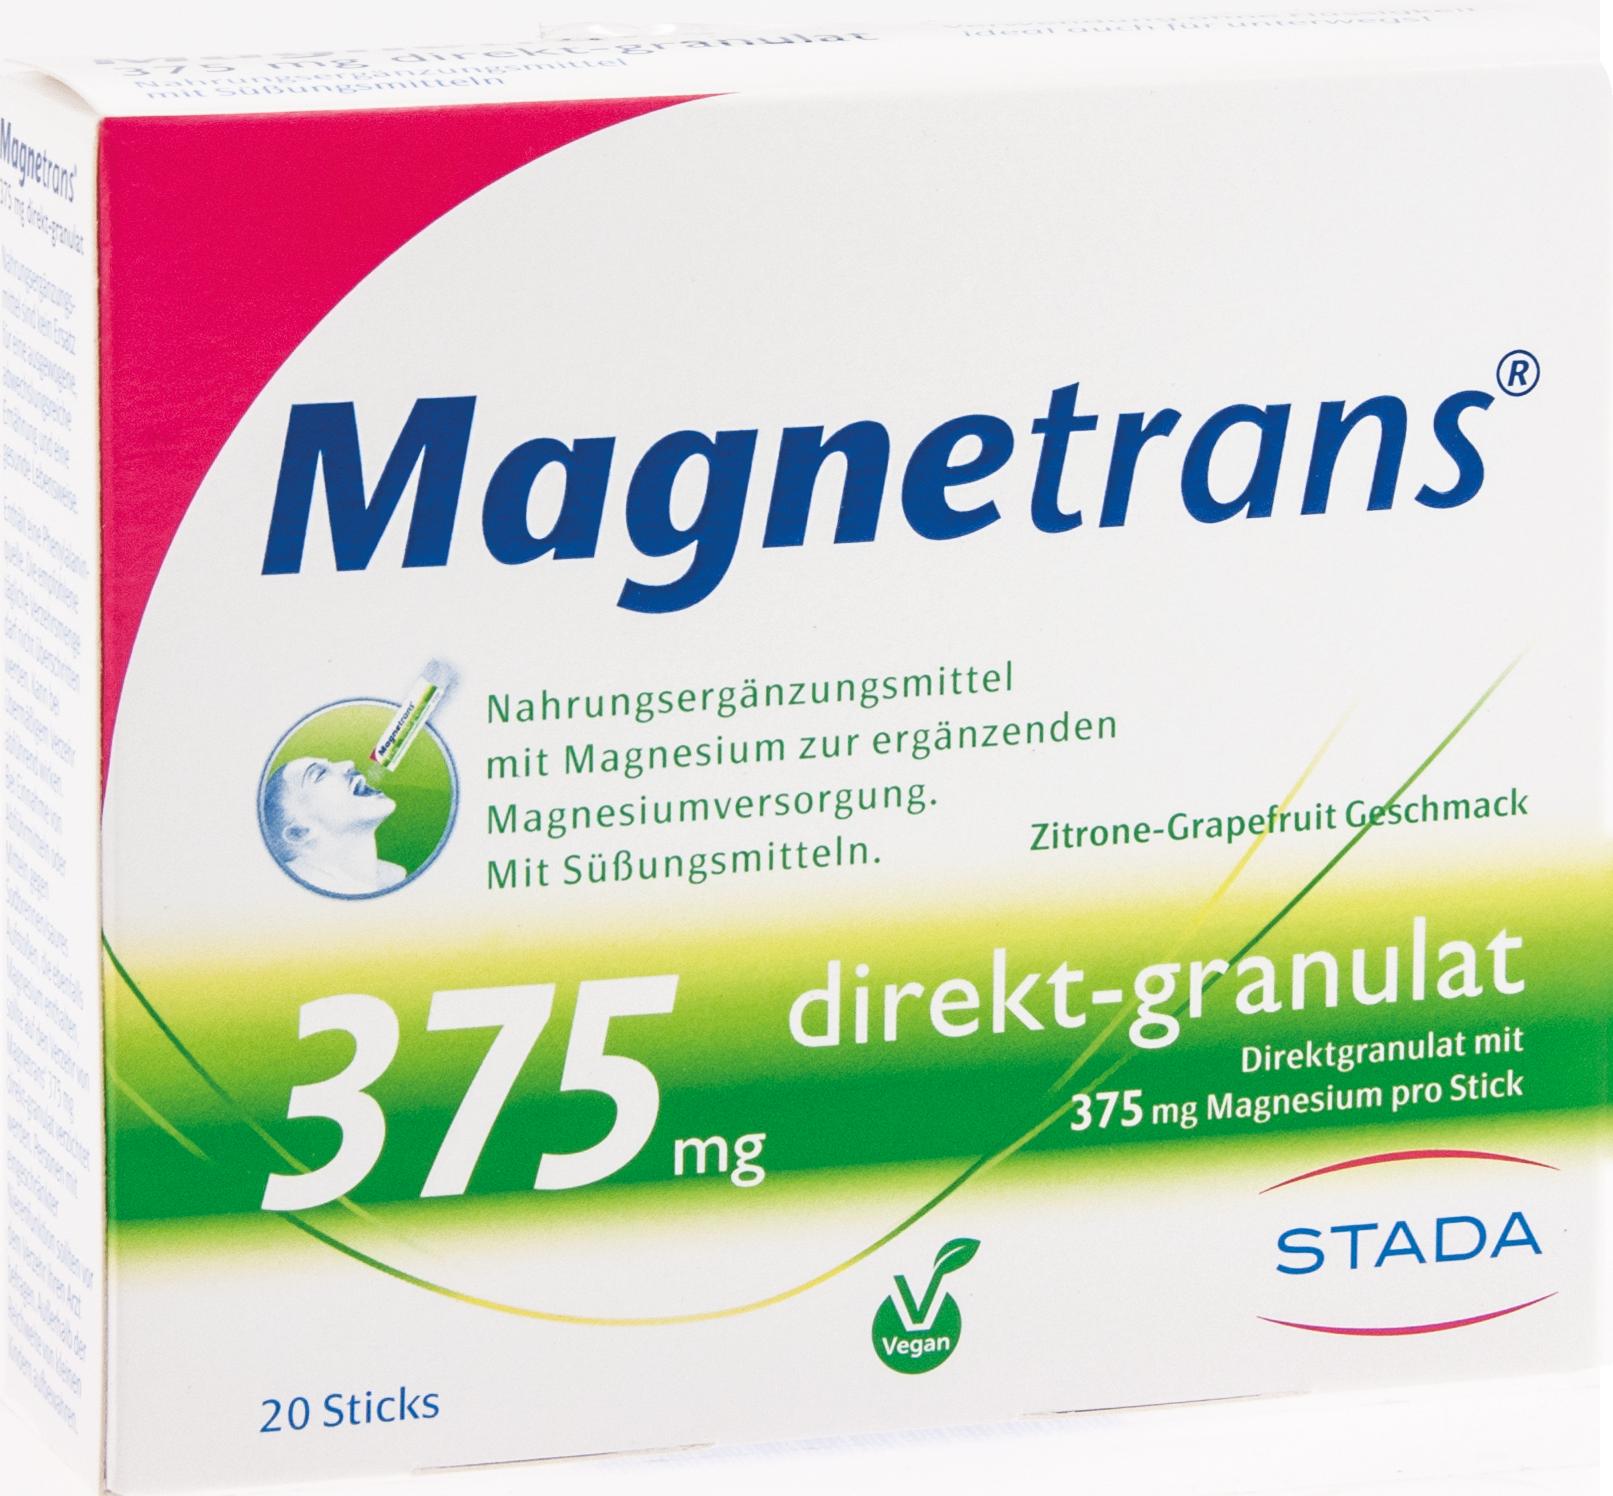 Magnetrans direkt 375mg